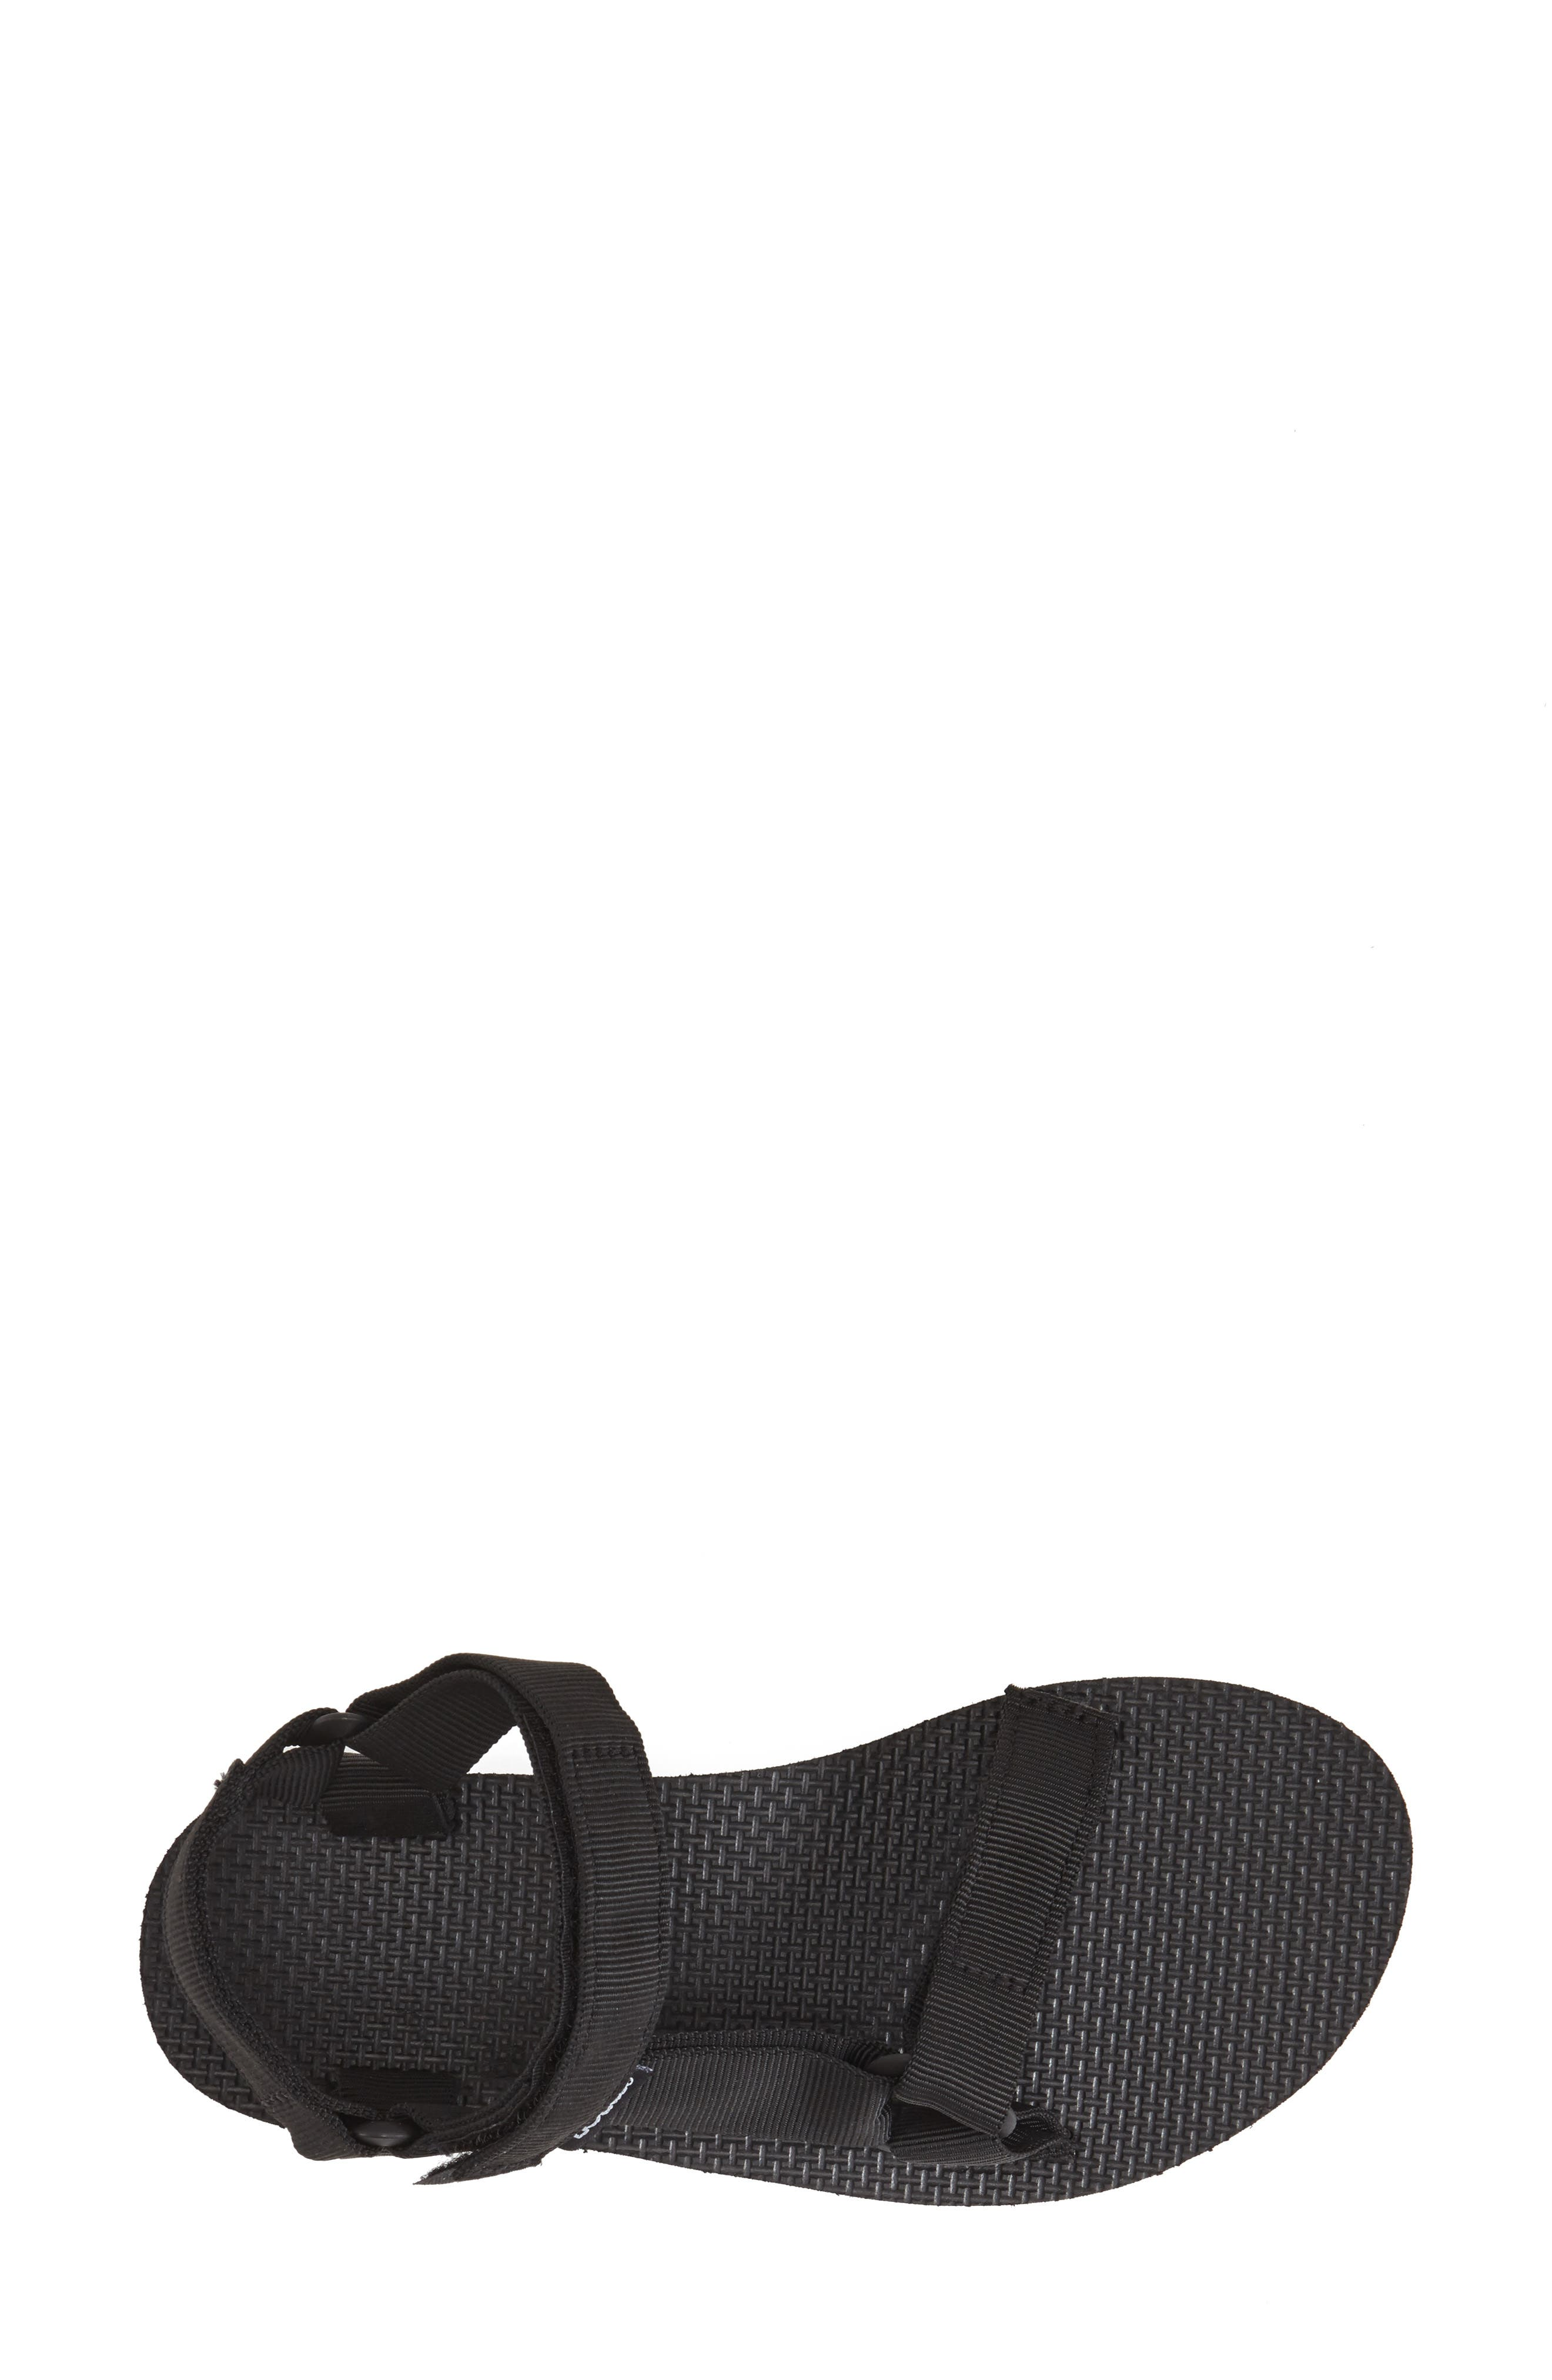 'Universal' Flatform Sandal,                             Alternate thumbnail 2, color,                             001